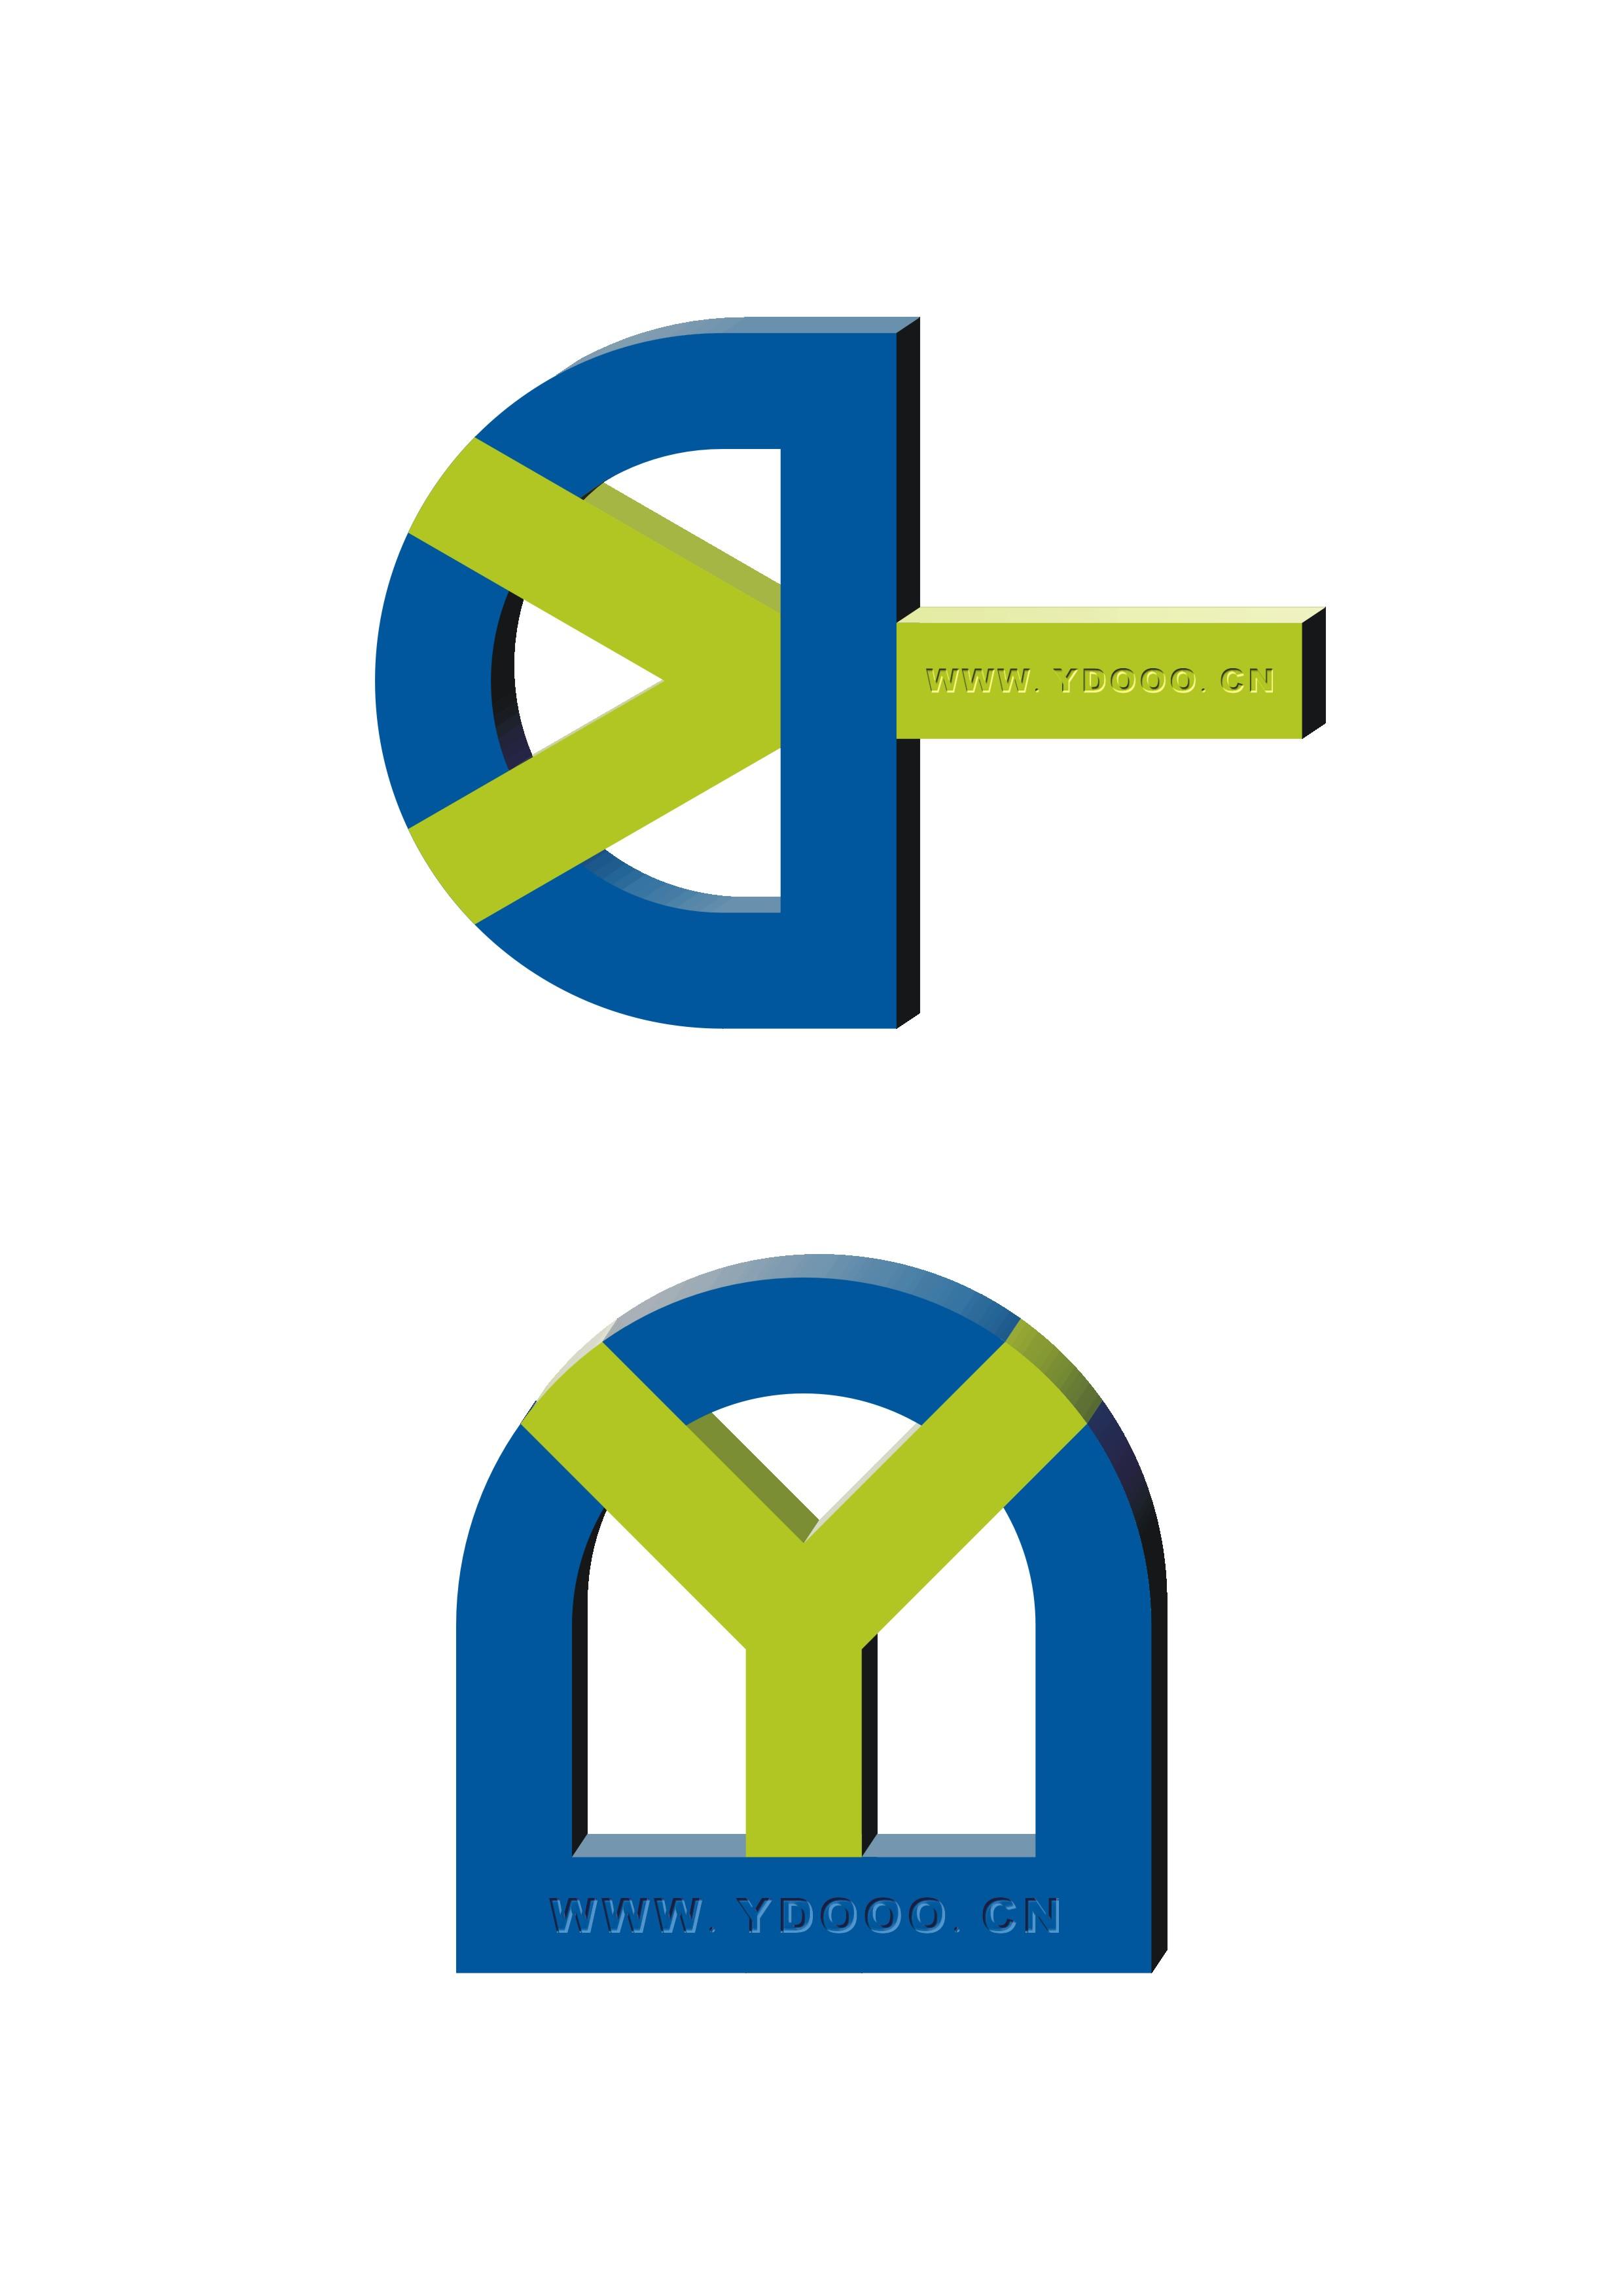 logo logo 标志 设计 矢量 矢量图 素材 图标 2480_3508 竖版 竖屏